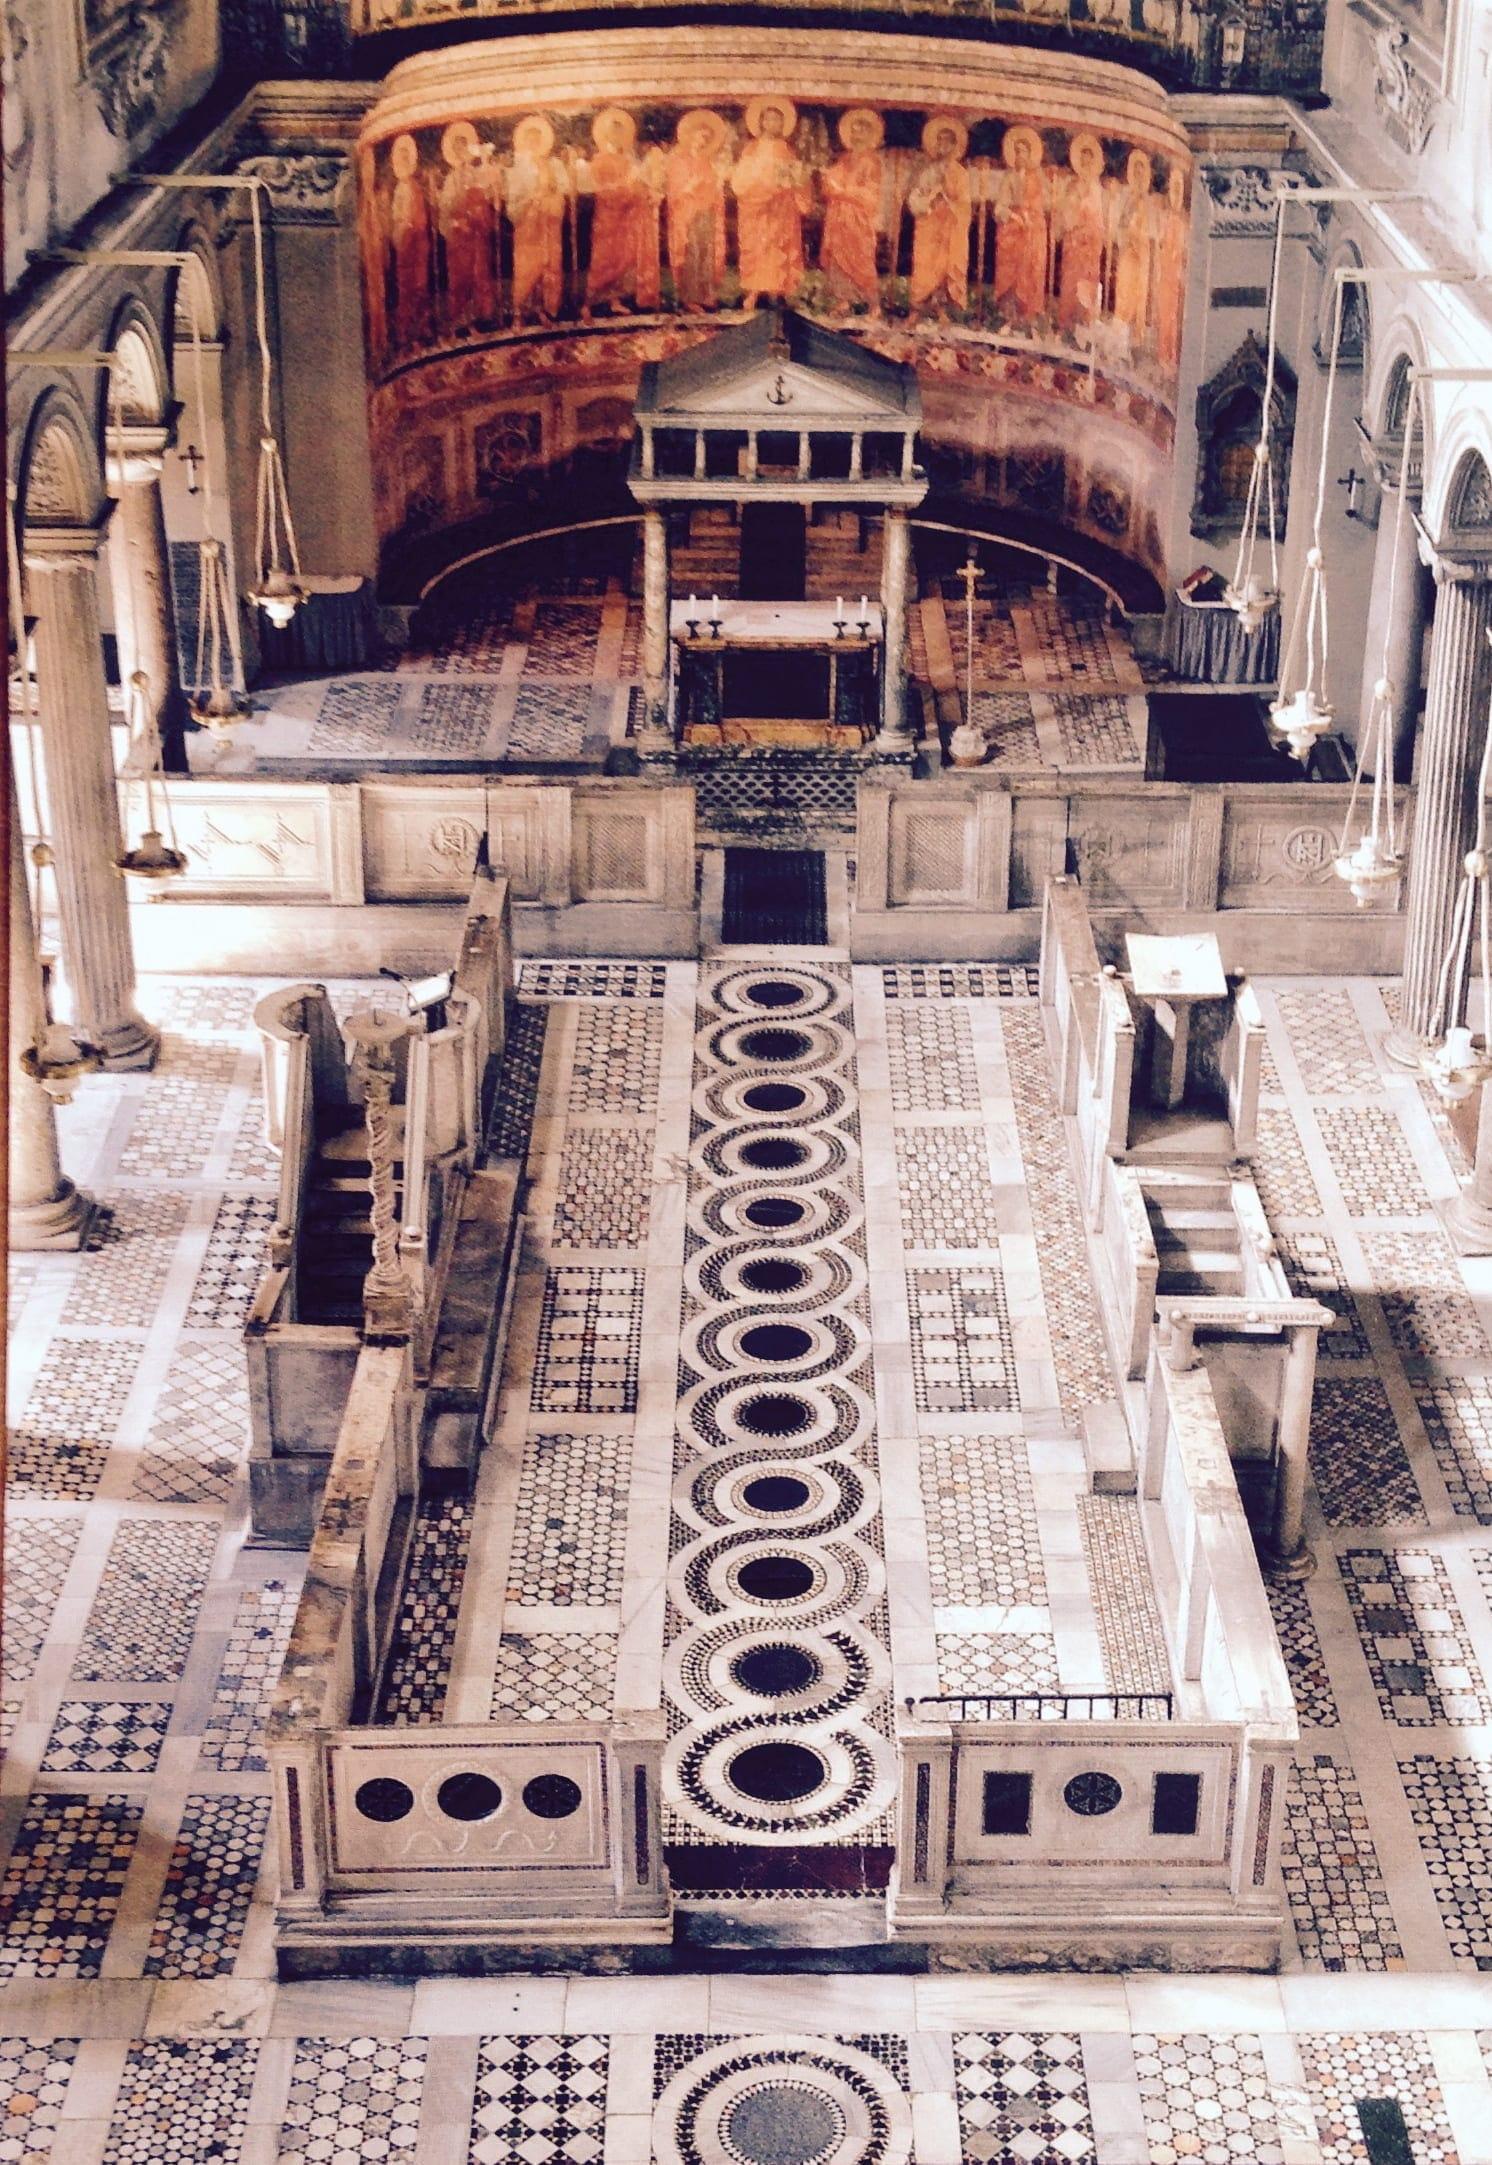 basilica san clemente - rome - italie (2)